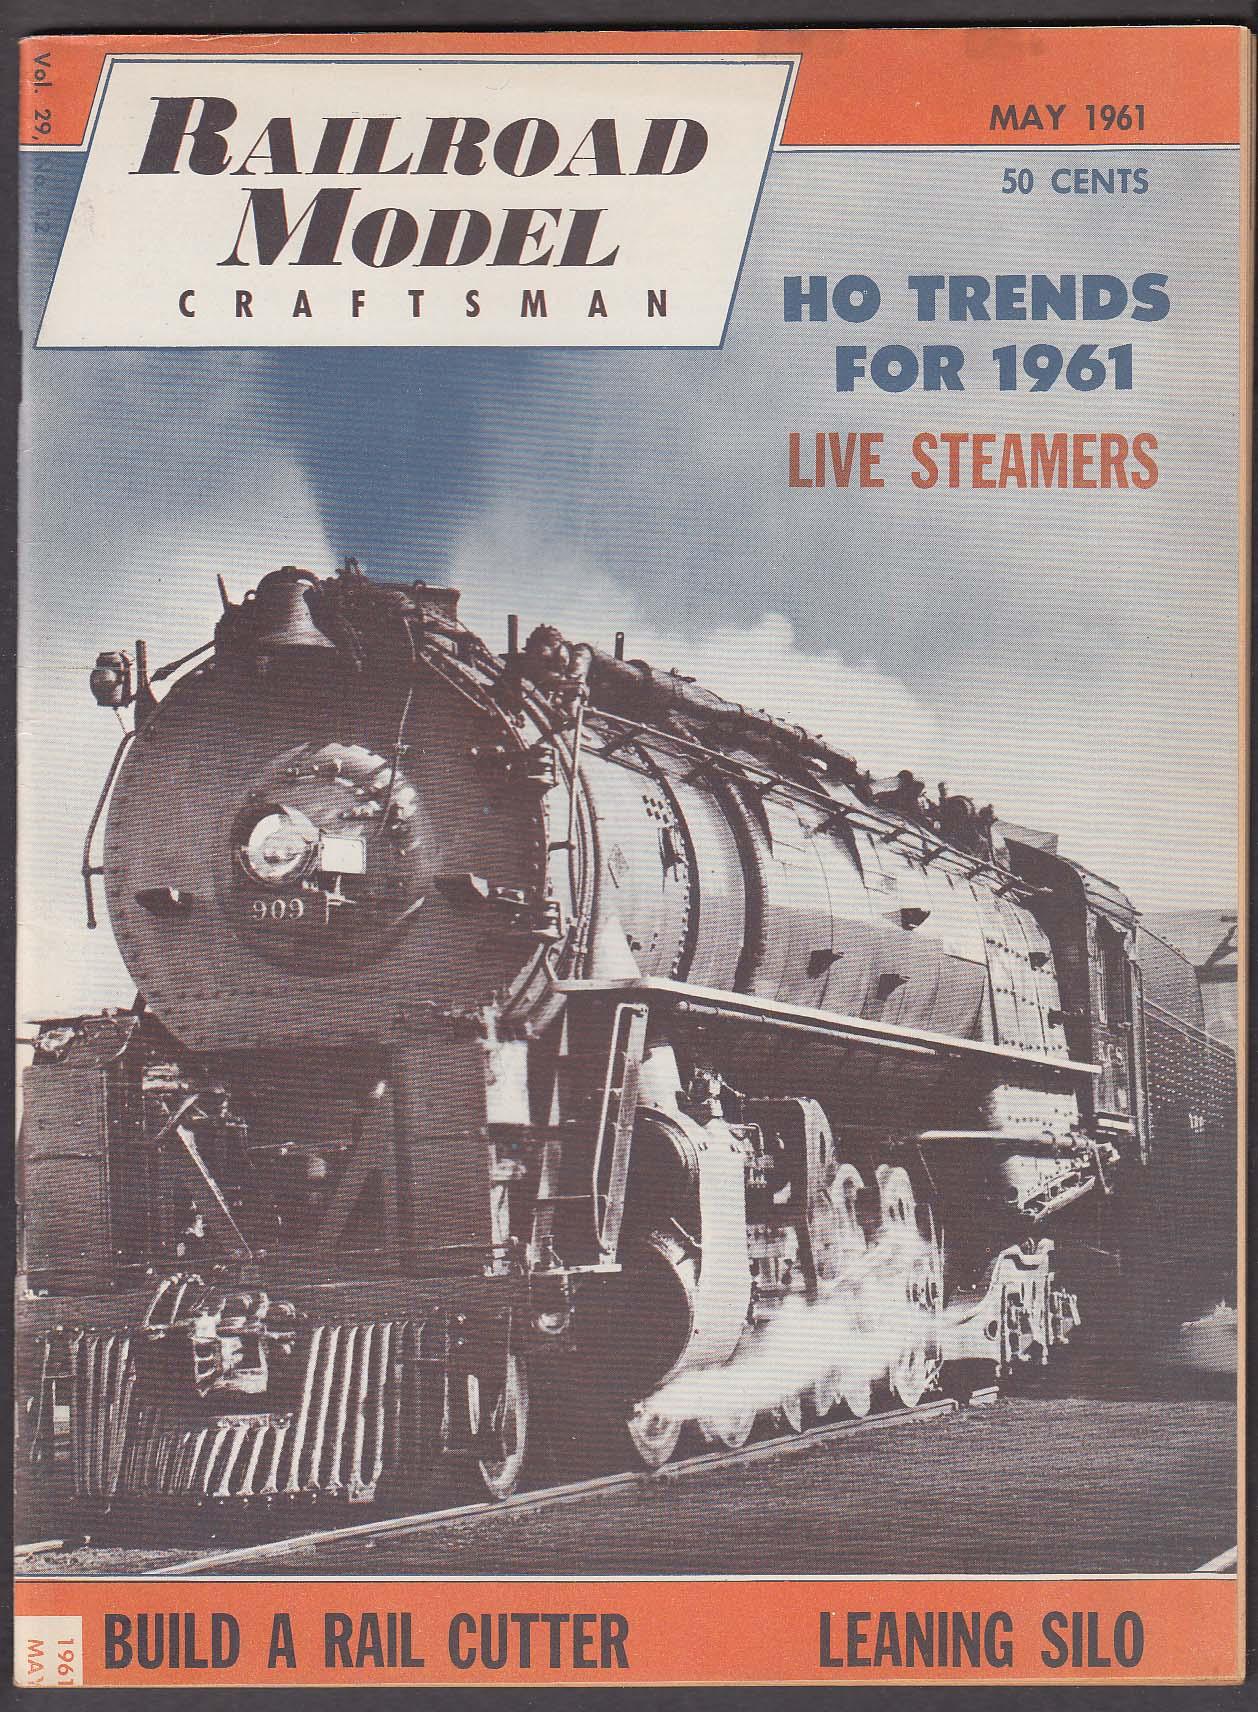 RAILROAD MODEL CRAFTSMAN HO Trends Rail Cutter Leaning Silo ++ 5 1961